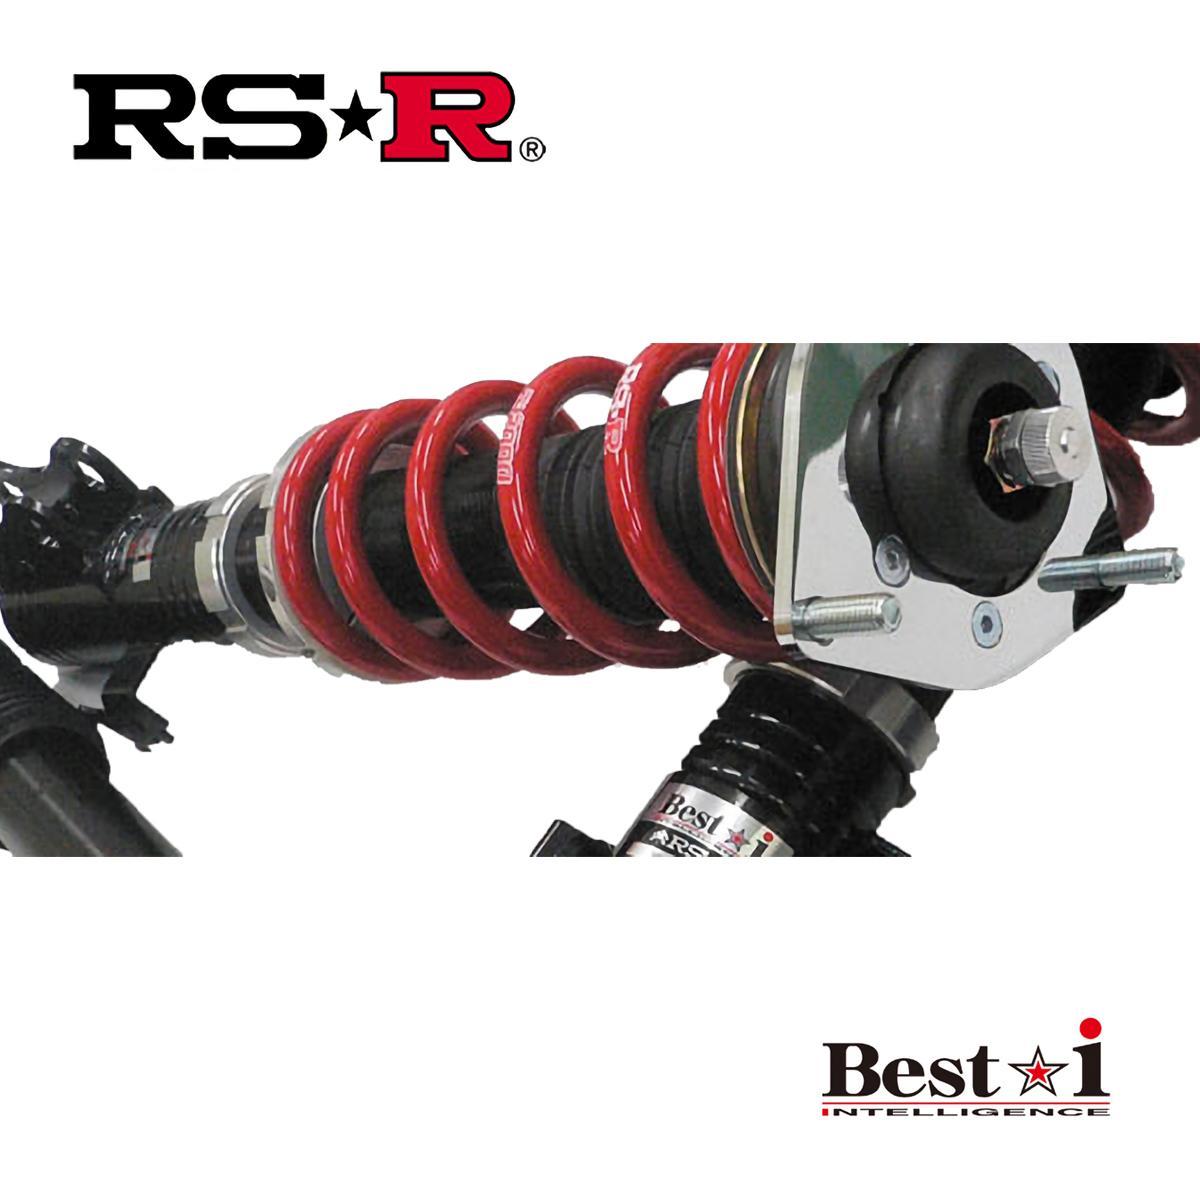 RS-R ロードスターRF VS 6AT NDERC 車高調 リア車高調整 全長式 SPIM030M ベストi 推奨仕様 RSR 条件付き送料無料